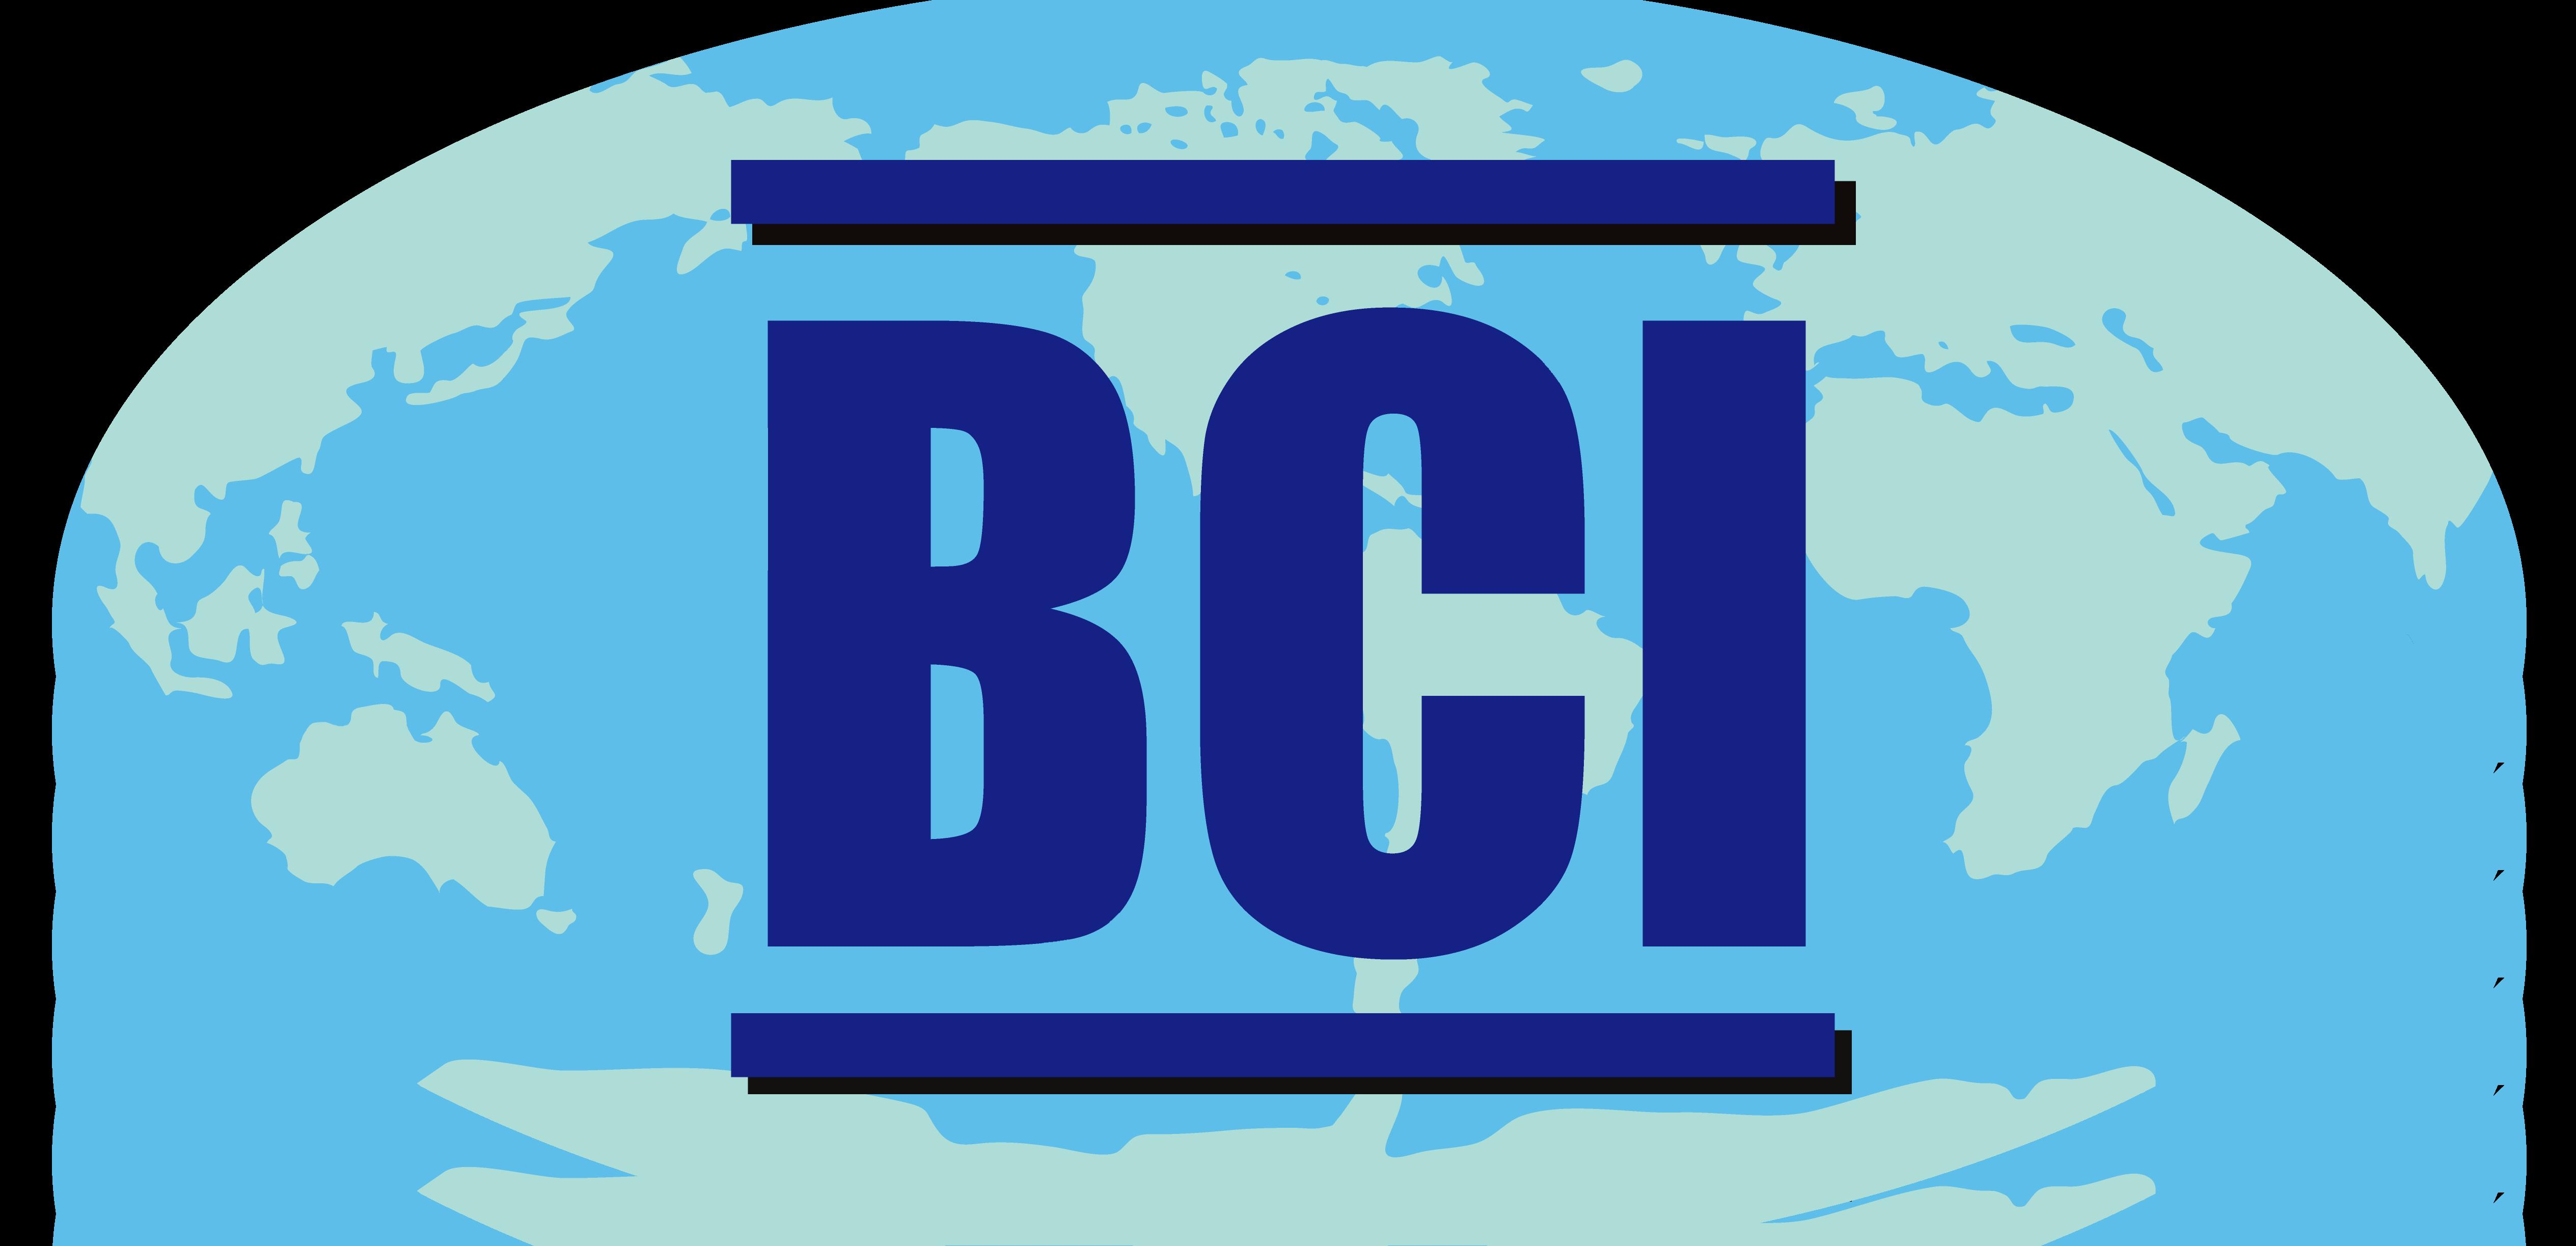 Basic Commerce & Industries logo